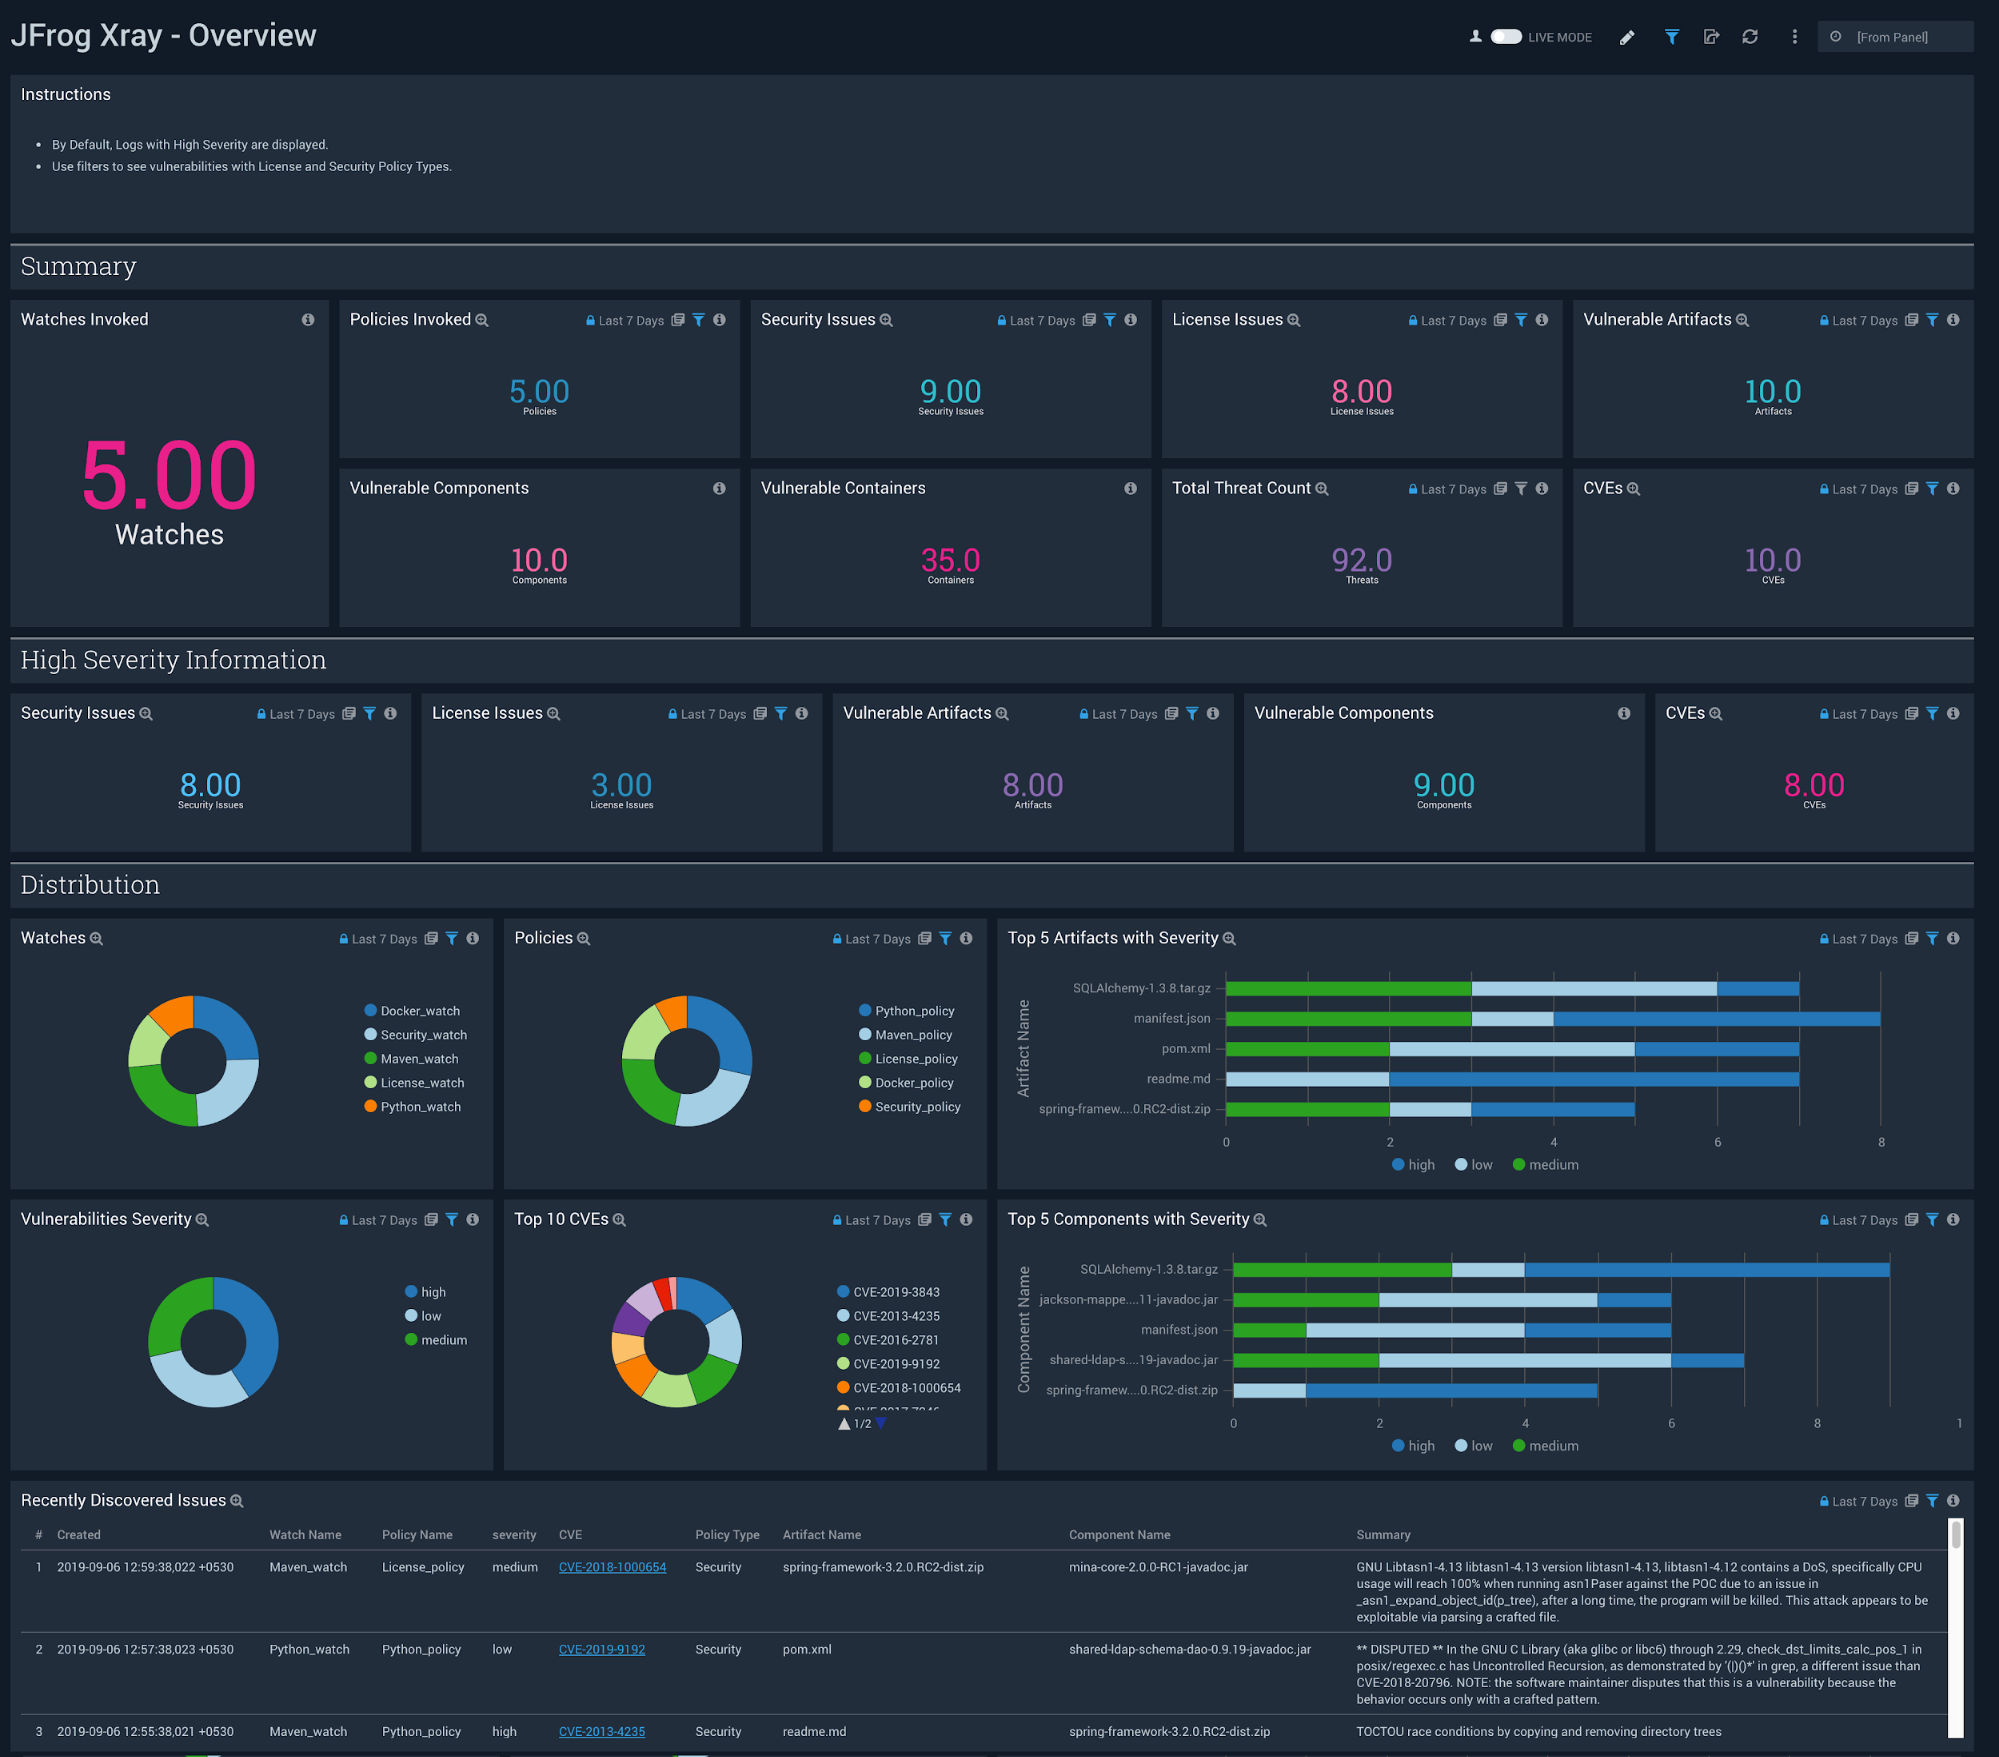 JFrog Xray - Vulnerability Overview